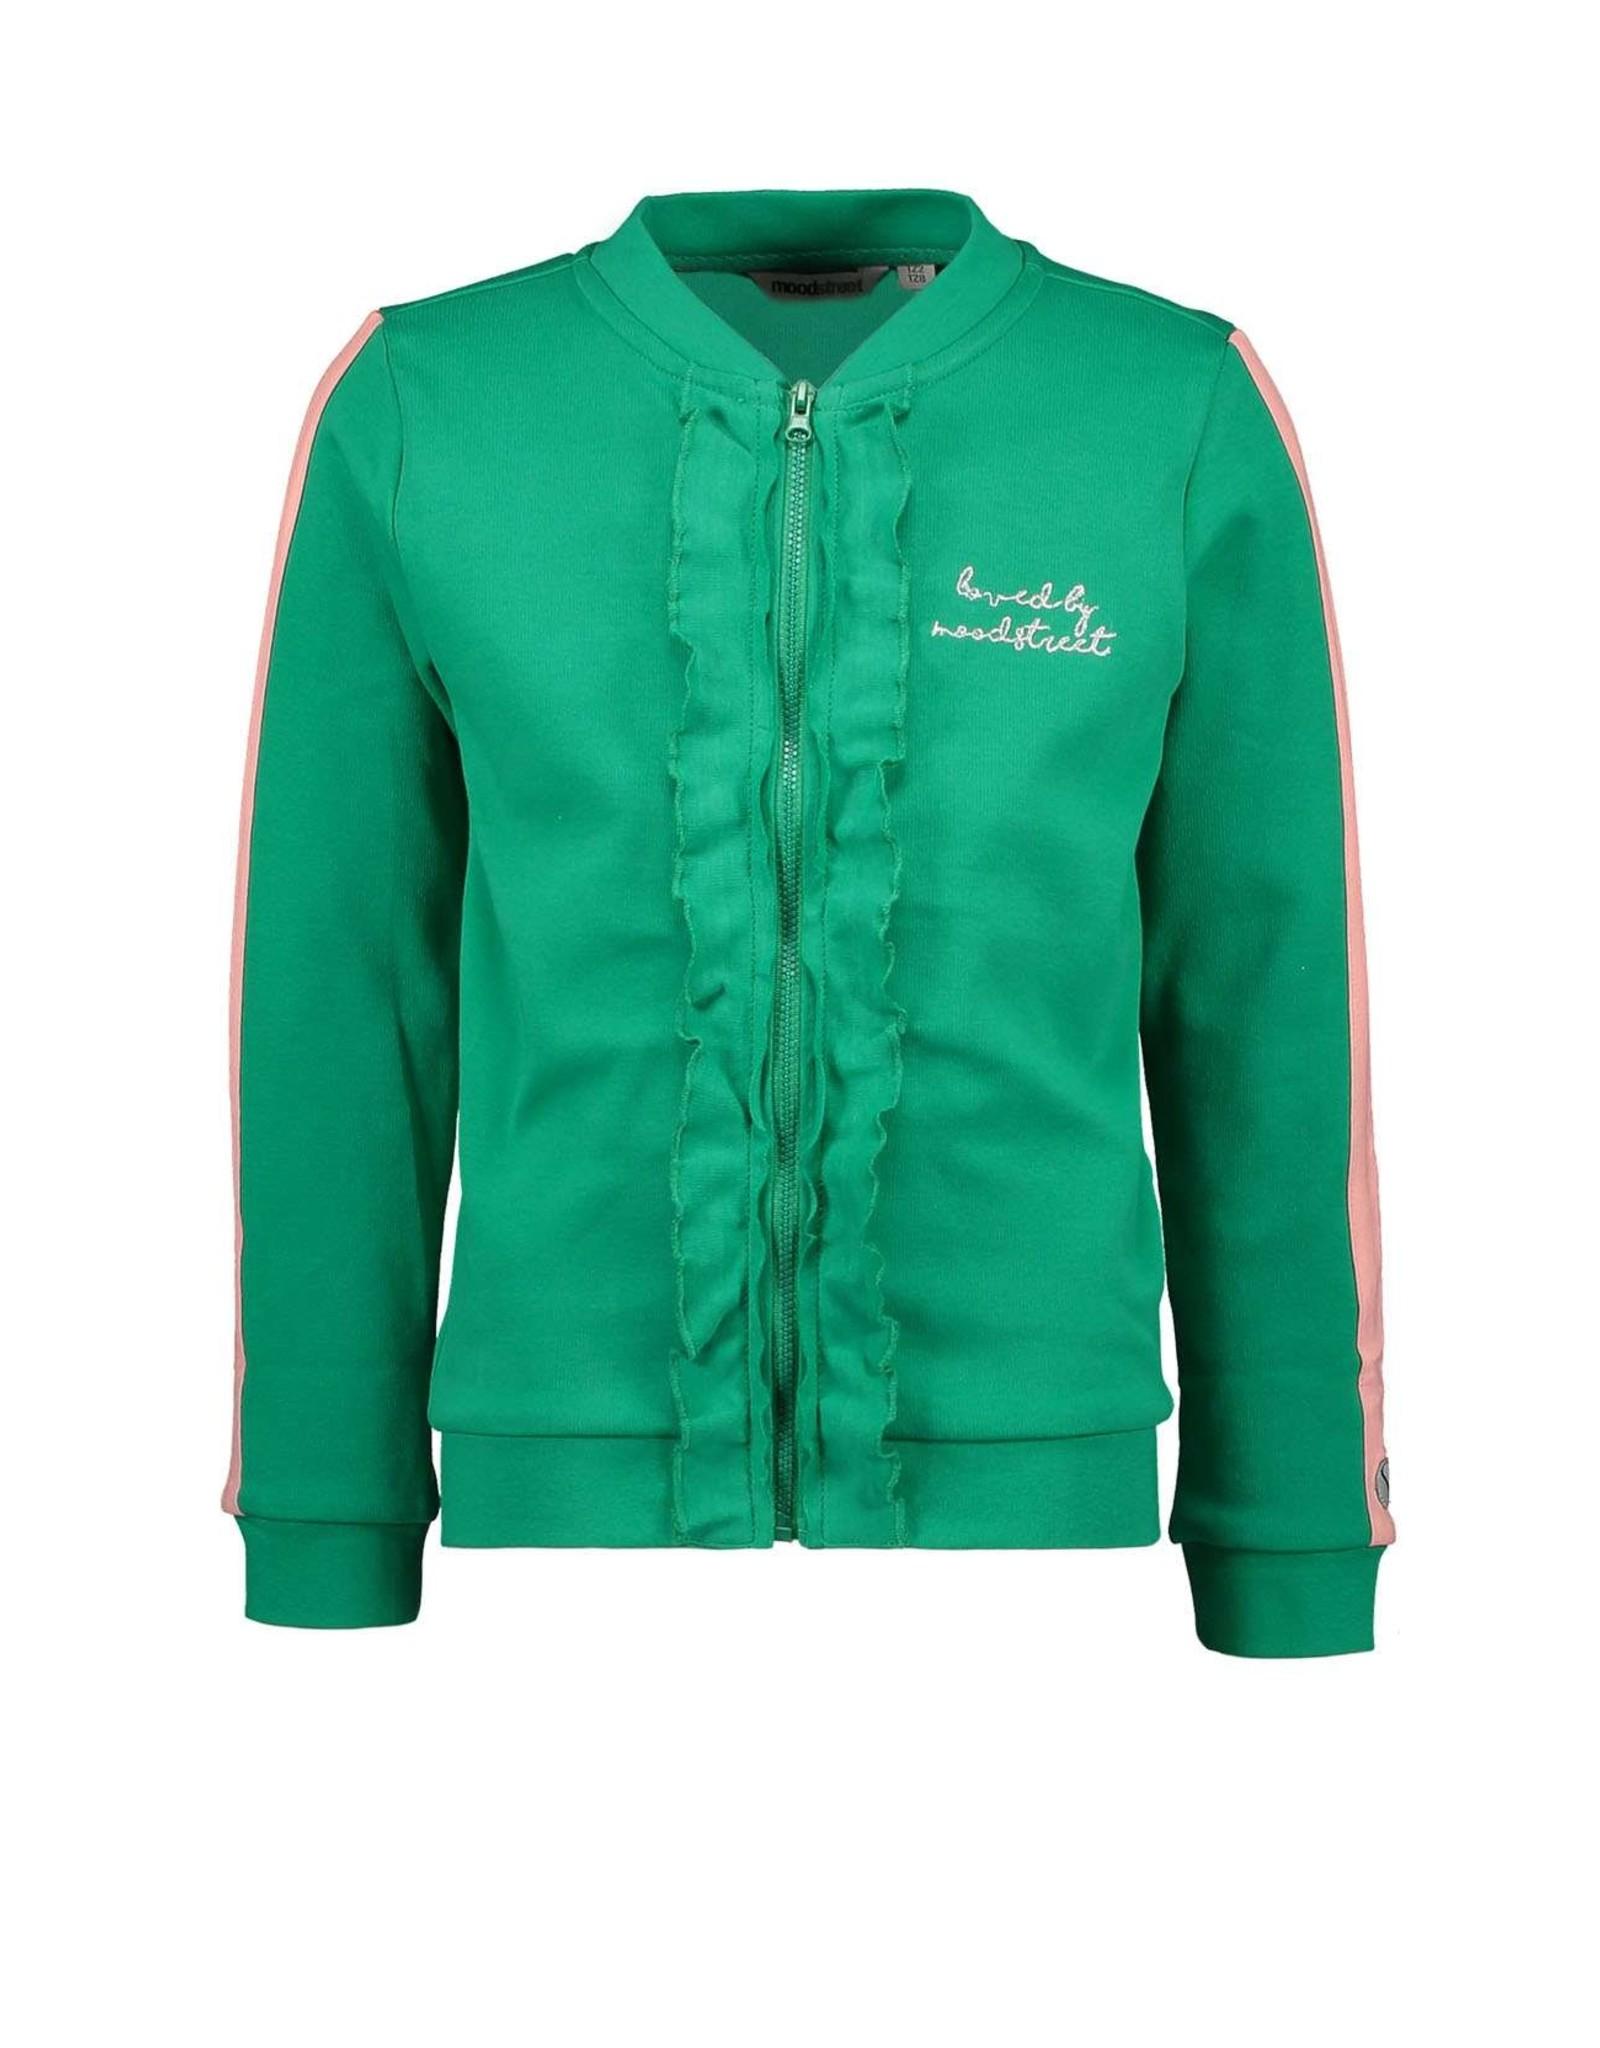 "Moodstreet Moodstreet-MT Vest With Frills-""Green"""